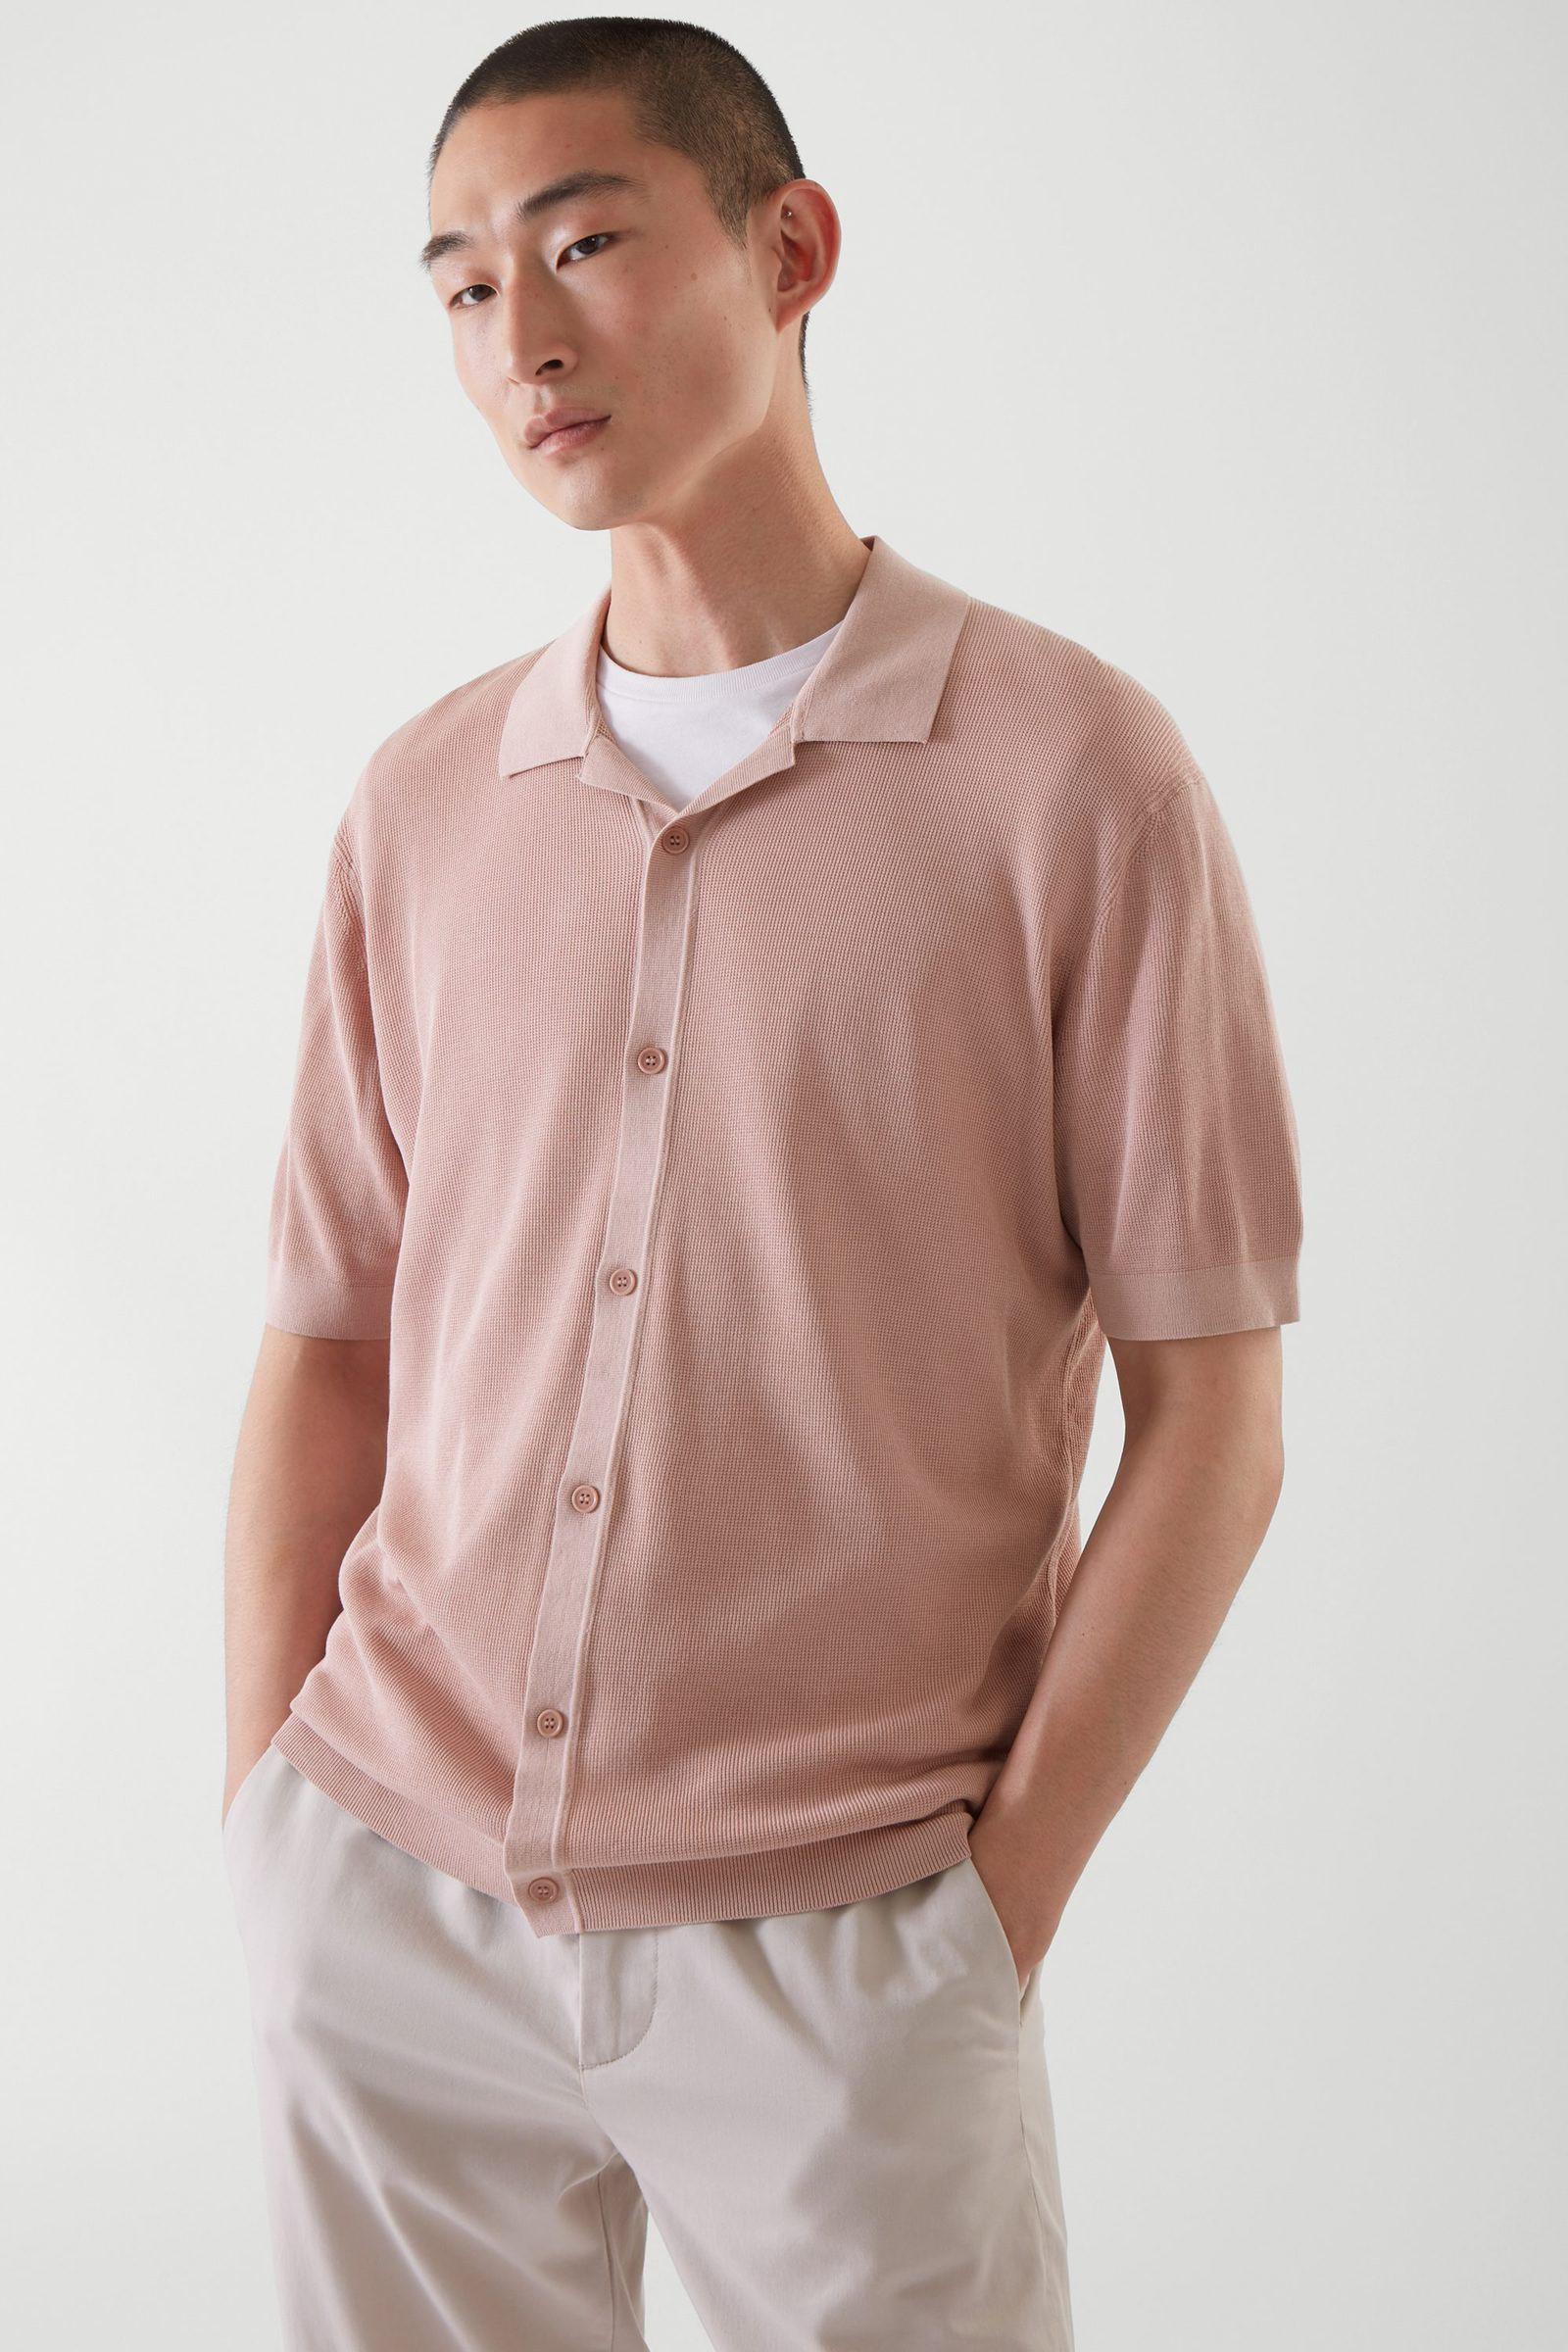 COS 니티드 캠프 칼라 쇼트 슬리브 셔츠의 더스티 핑크컬러 ECOMLook입니다.